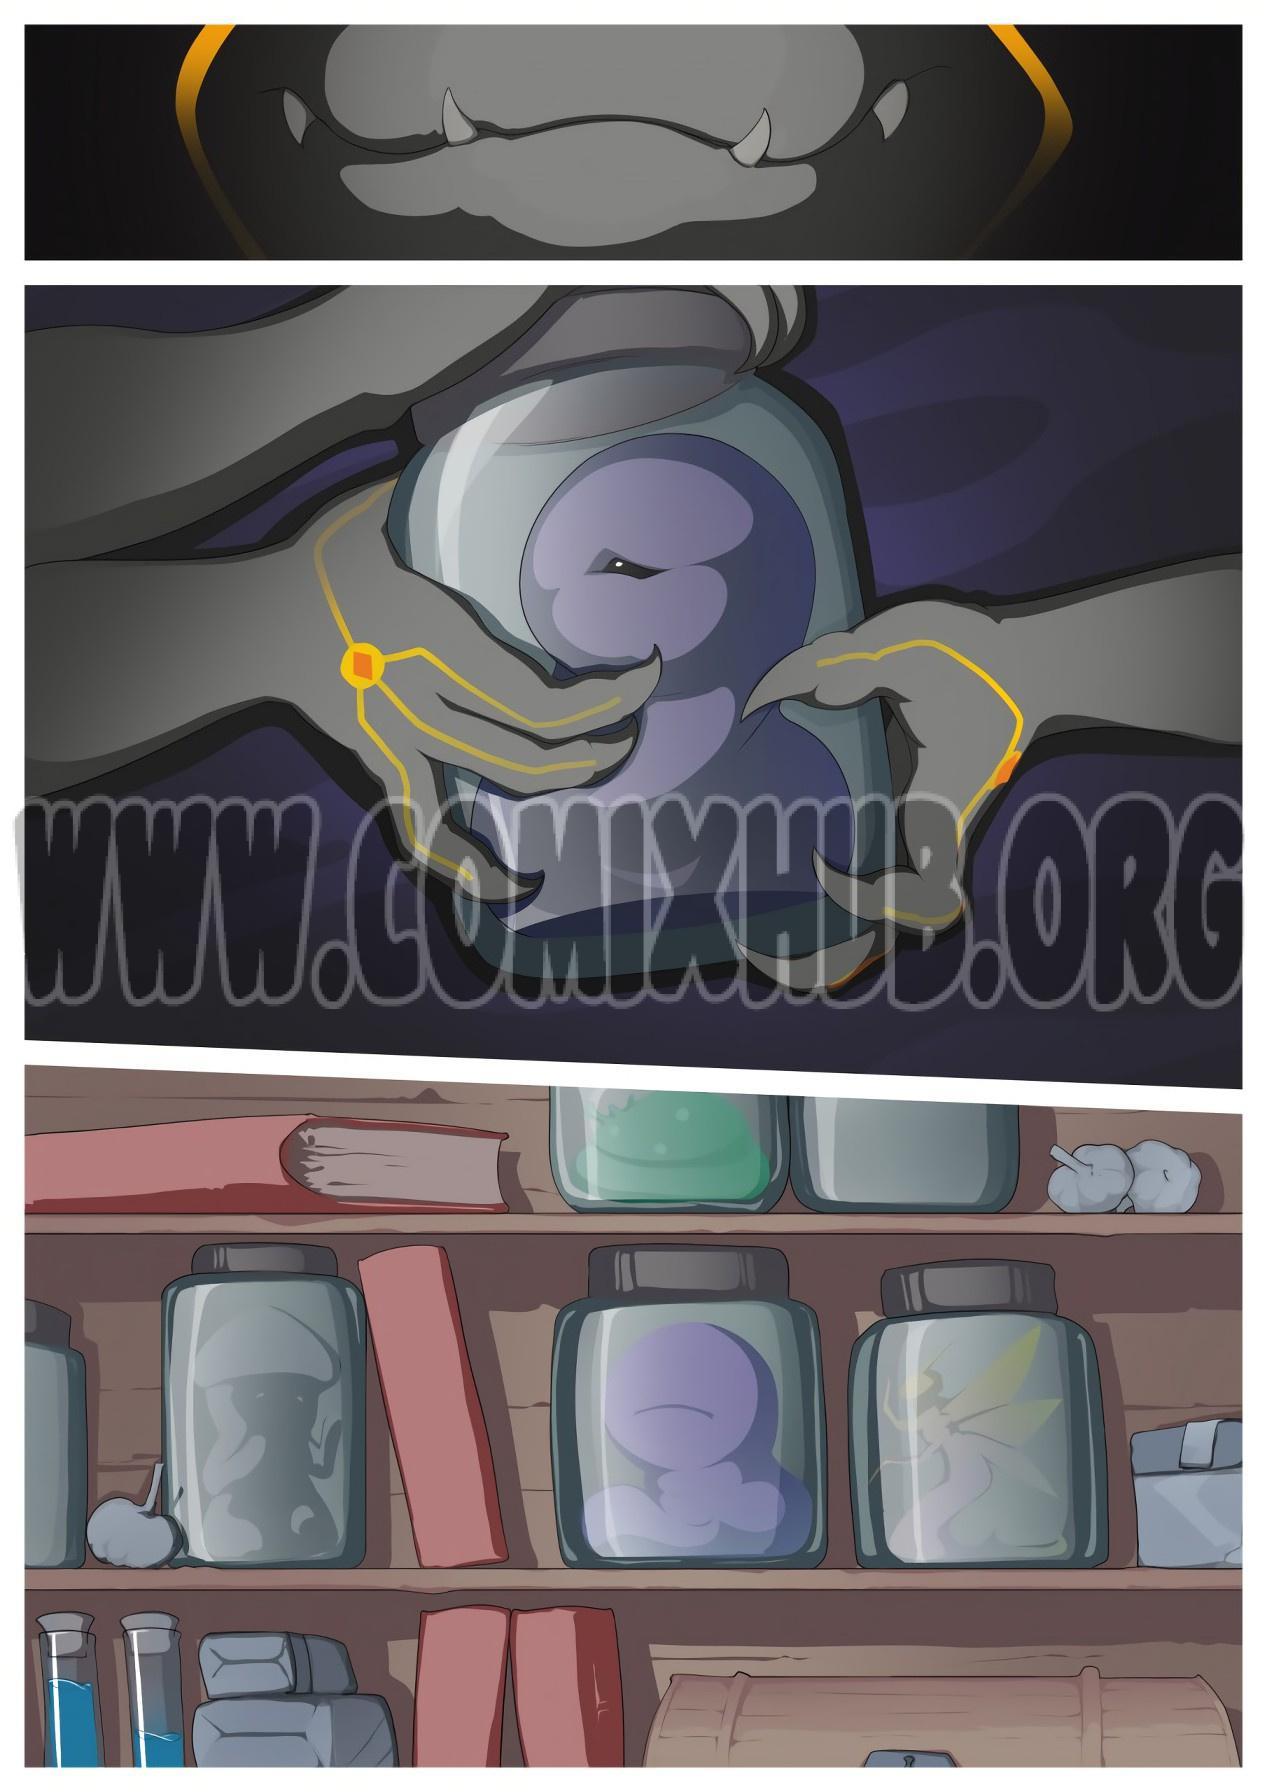 The Hunt - Okata porn comics Masturbation, Creampie, Fantasy, Furry, Rape, Straight, Tentacles, X-Ray